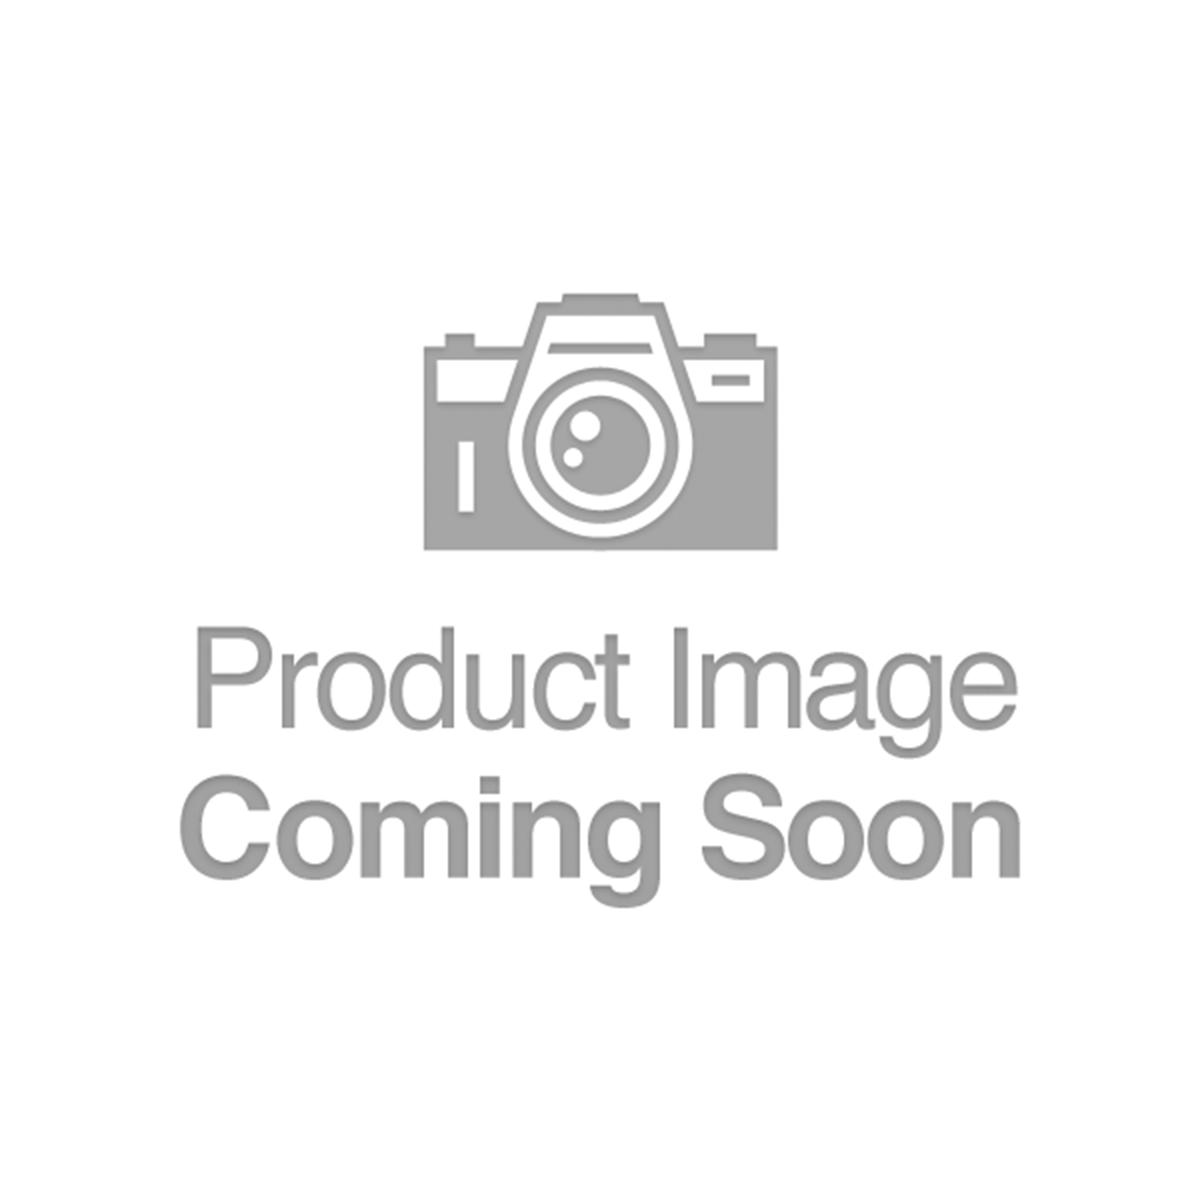 Rolla - North Dakota - CH 6157 - FR 634 - PMG 15